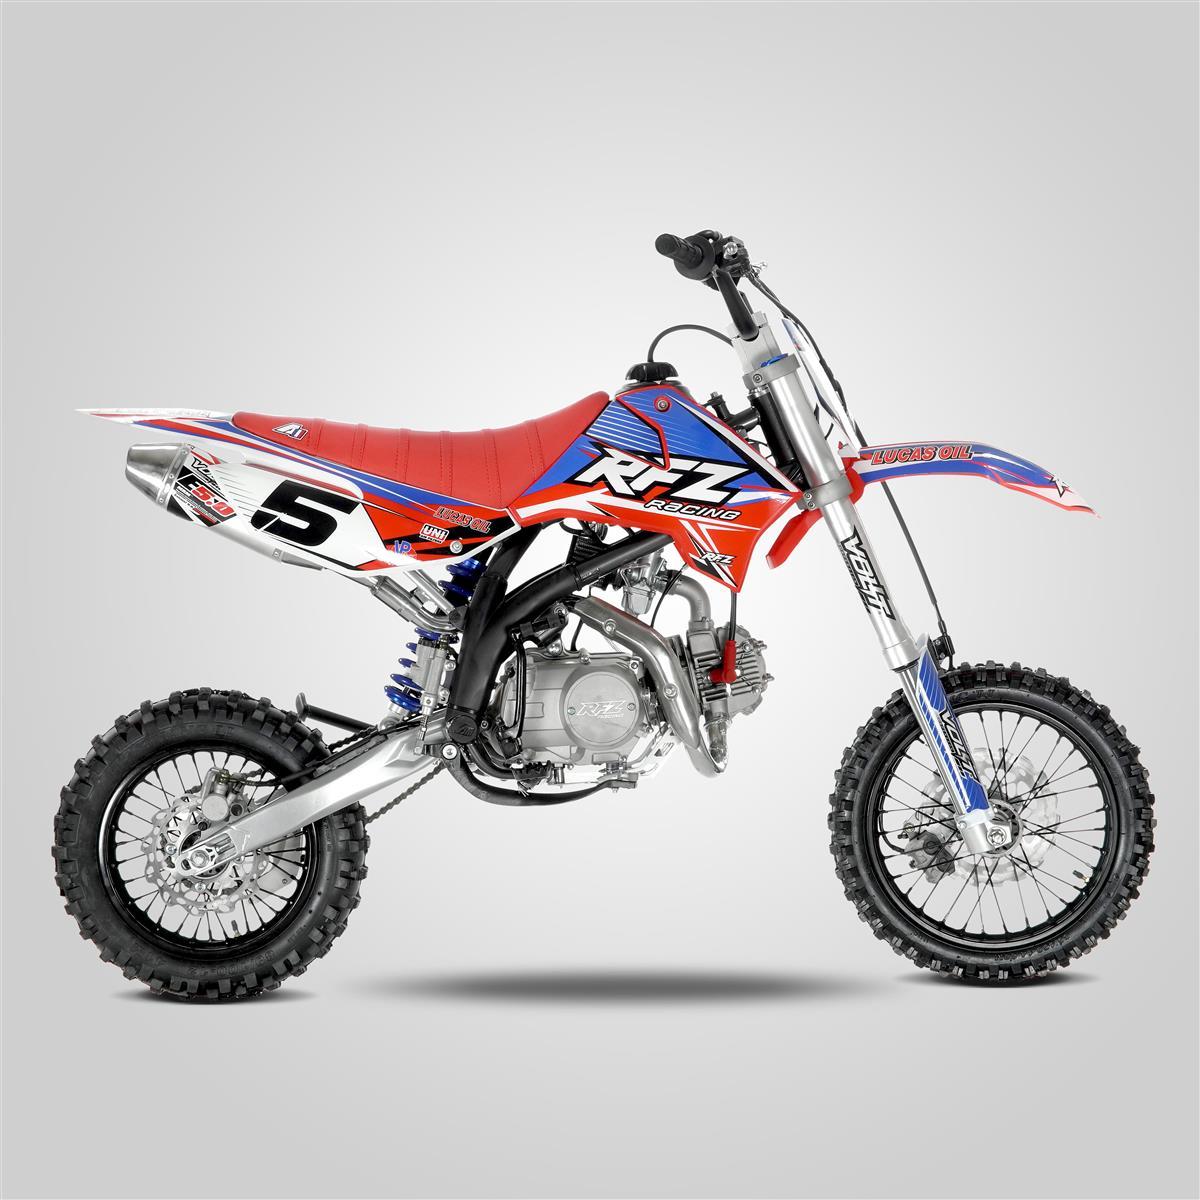 minicross apollo rfz open 125 smallmx dirt bike pit bike. Black Bedroom Furniture Sets. Home Design Ideas